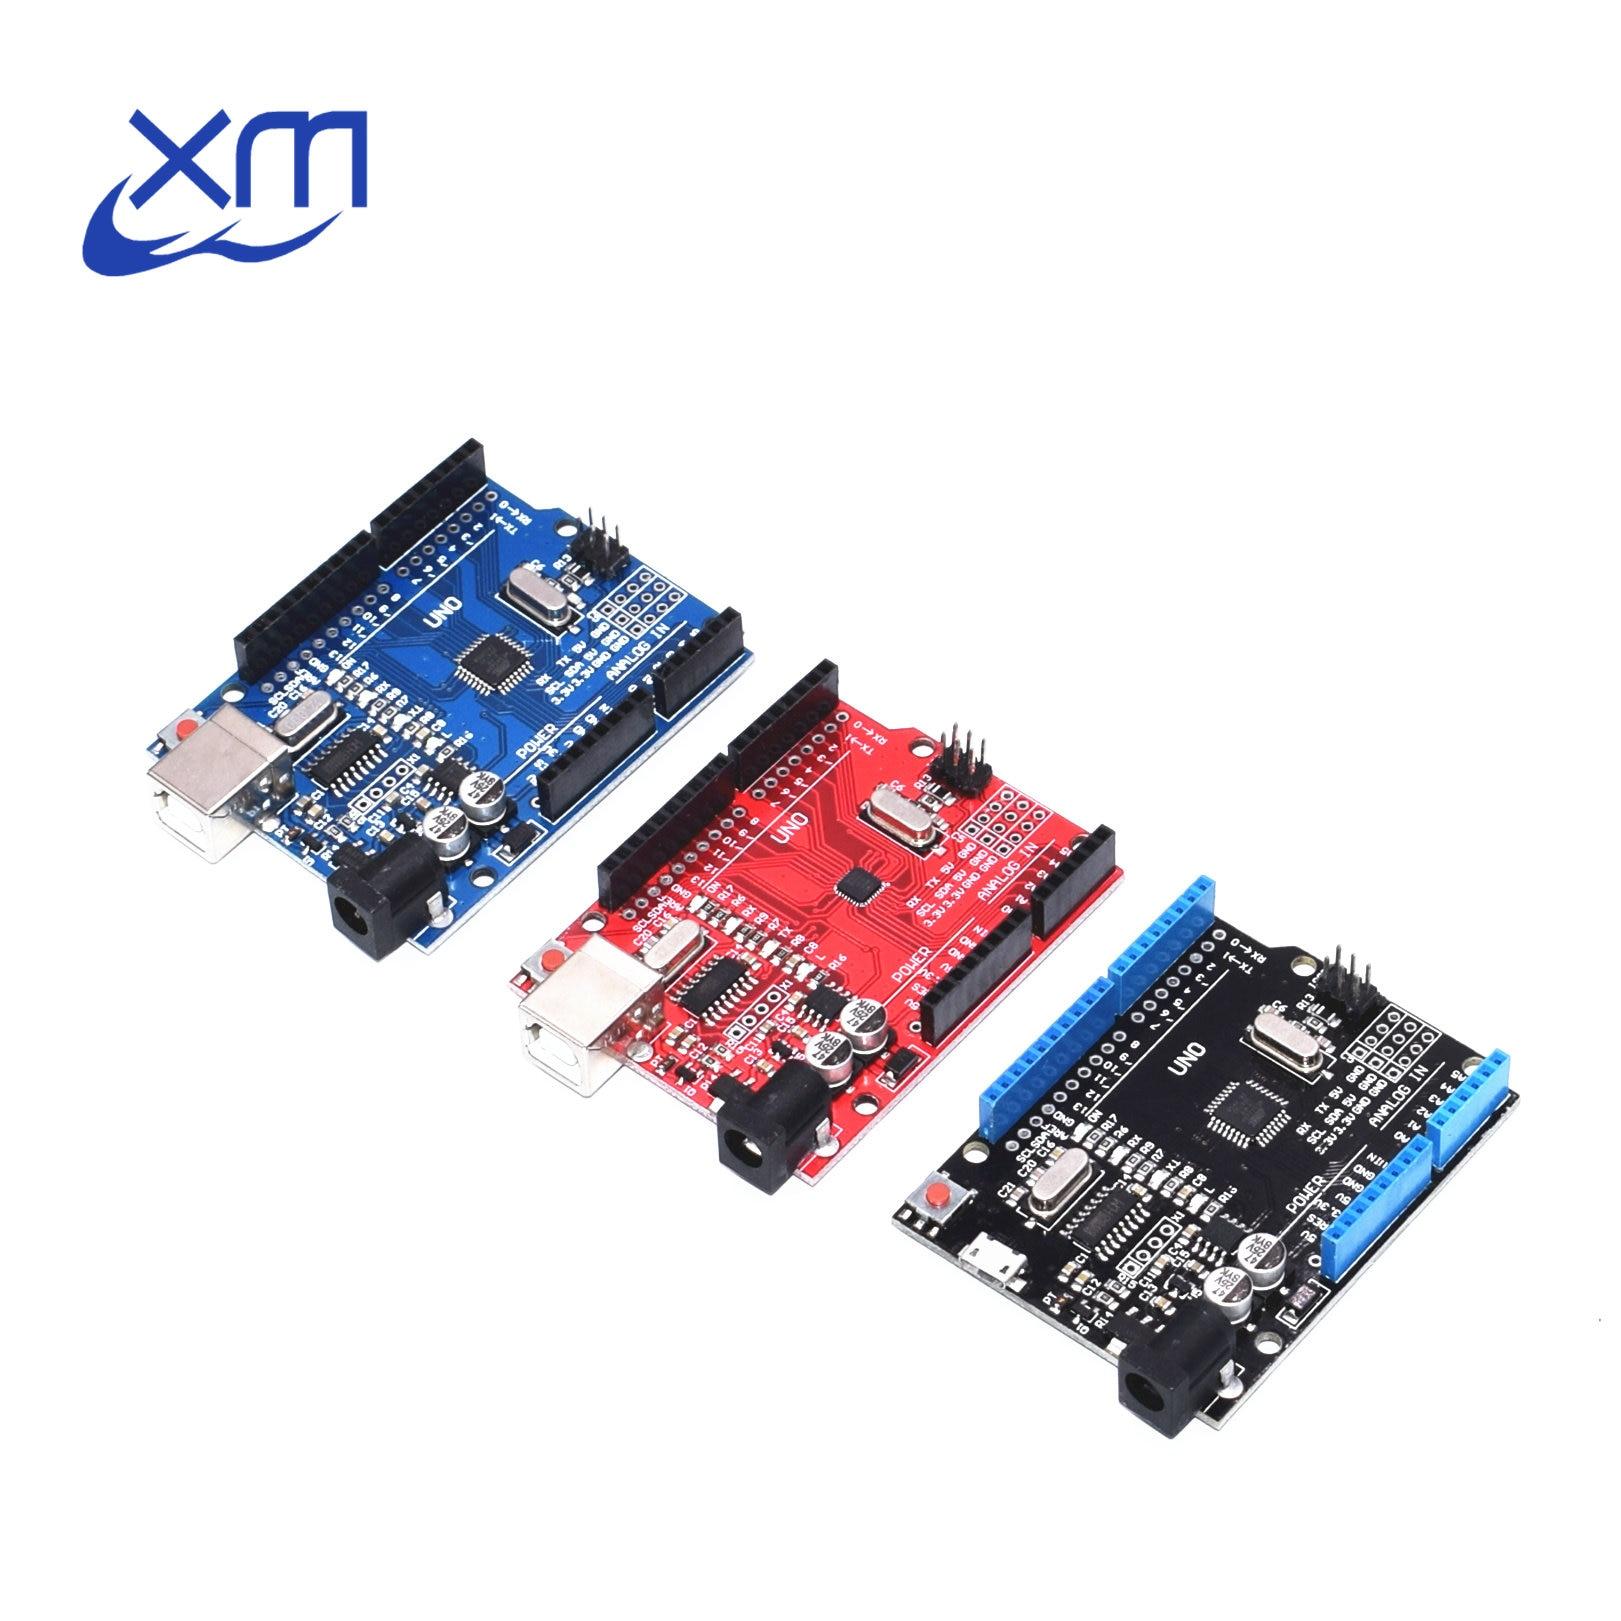 um-conjunto-uno-r3-ch340g-mega328p-chip-16-mhz-r3-boad-nova-versao-para-font-b-arduino-b-font-uno